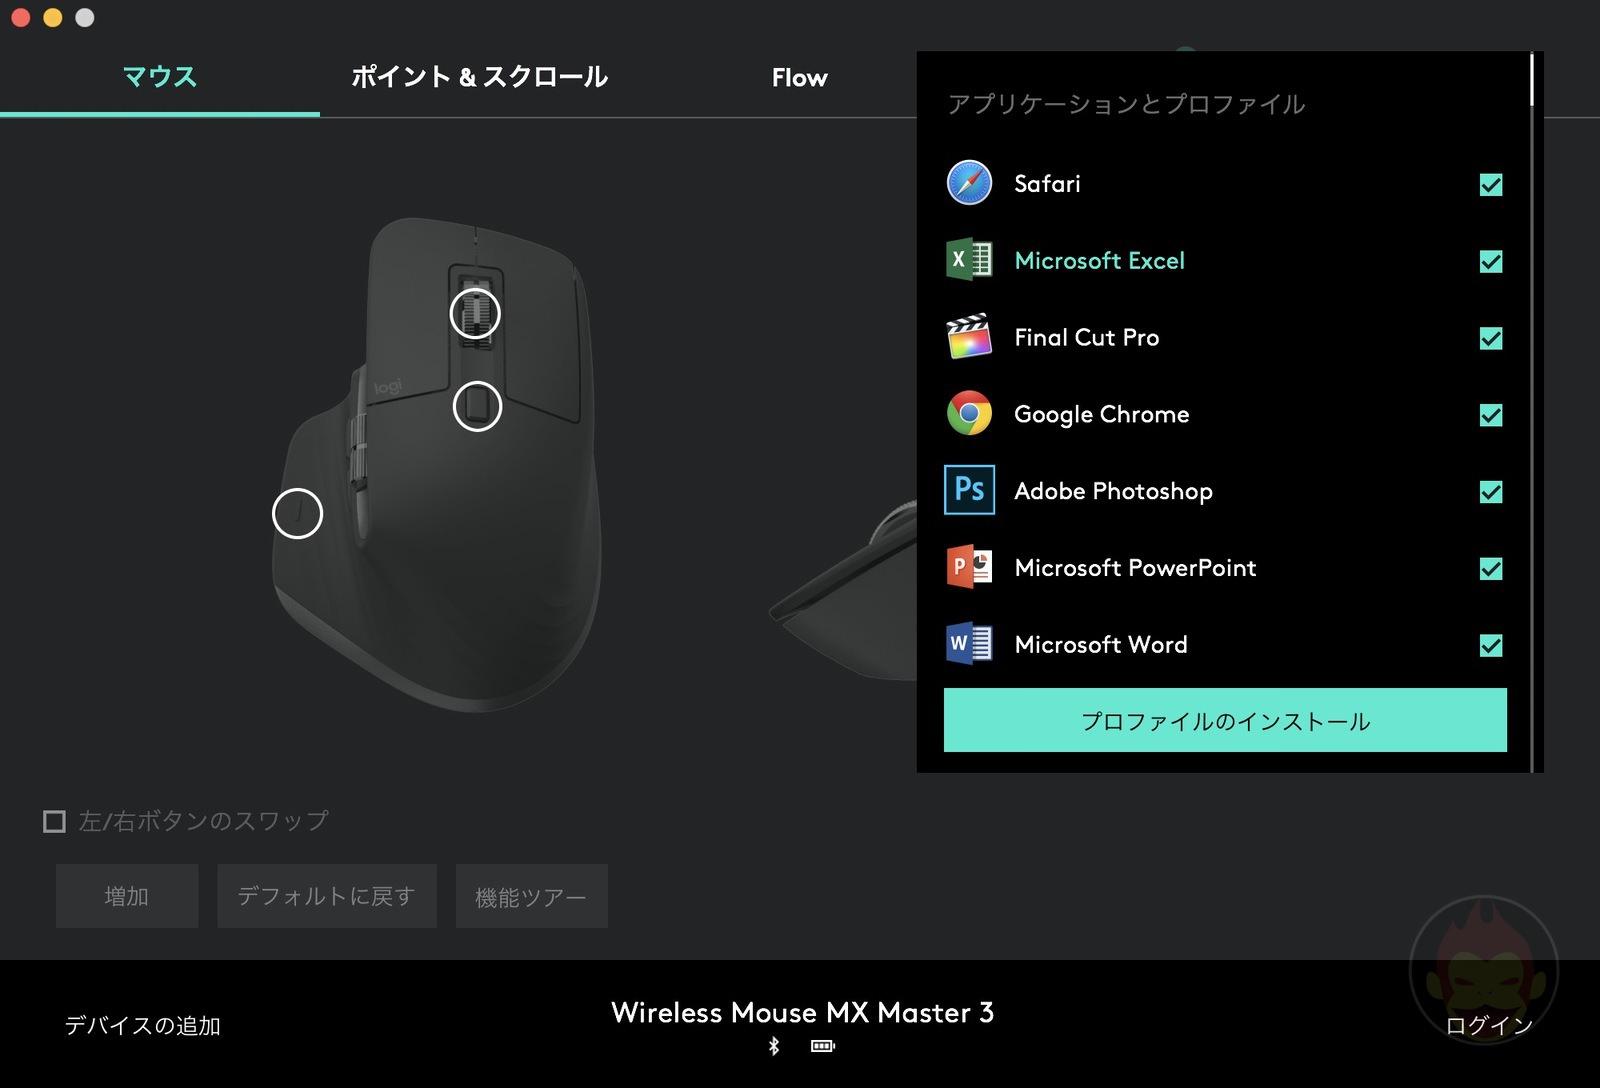 Logi-Options-MX-Master-3-03.jpg